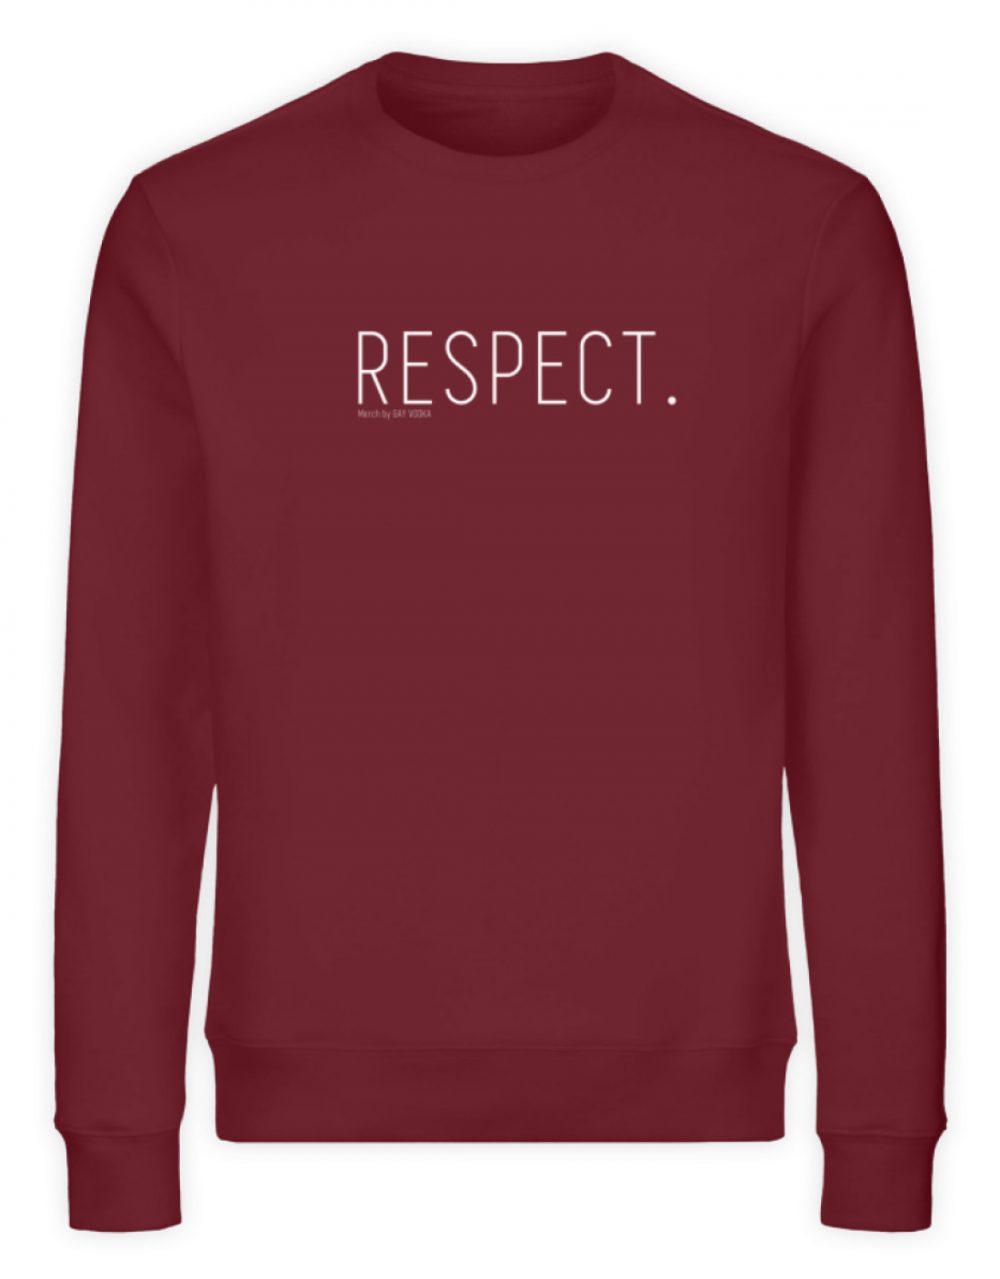 RESPECT. - Unisex Organic Sweatshirt-6883